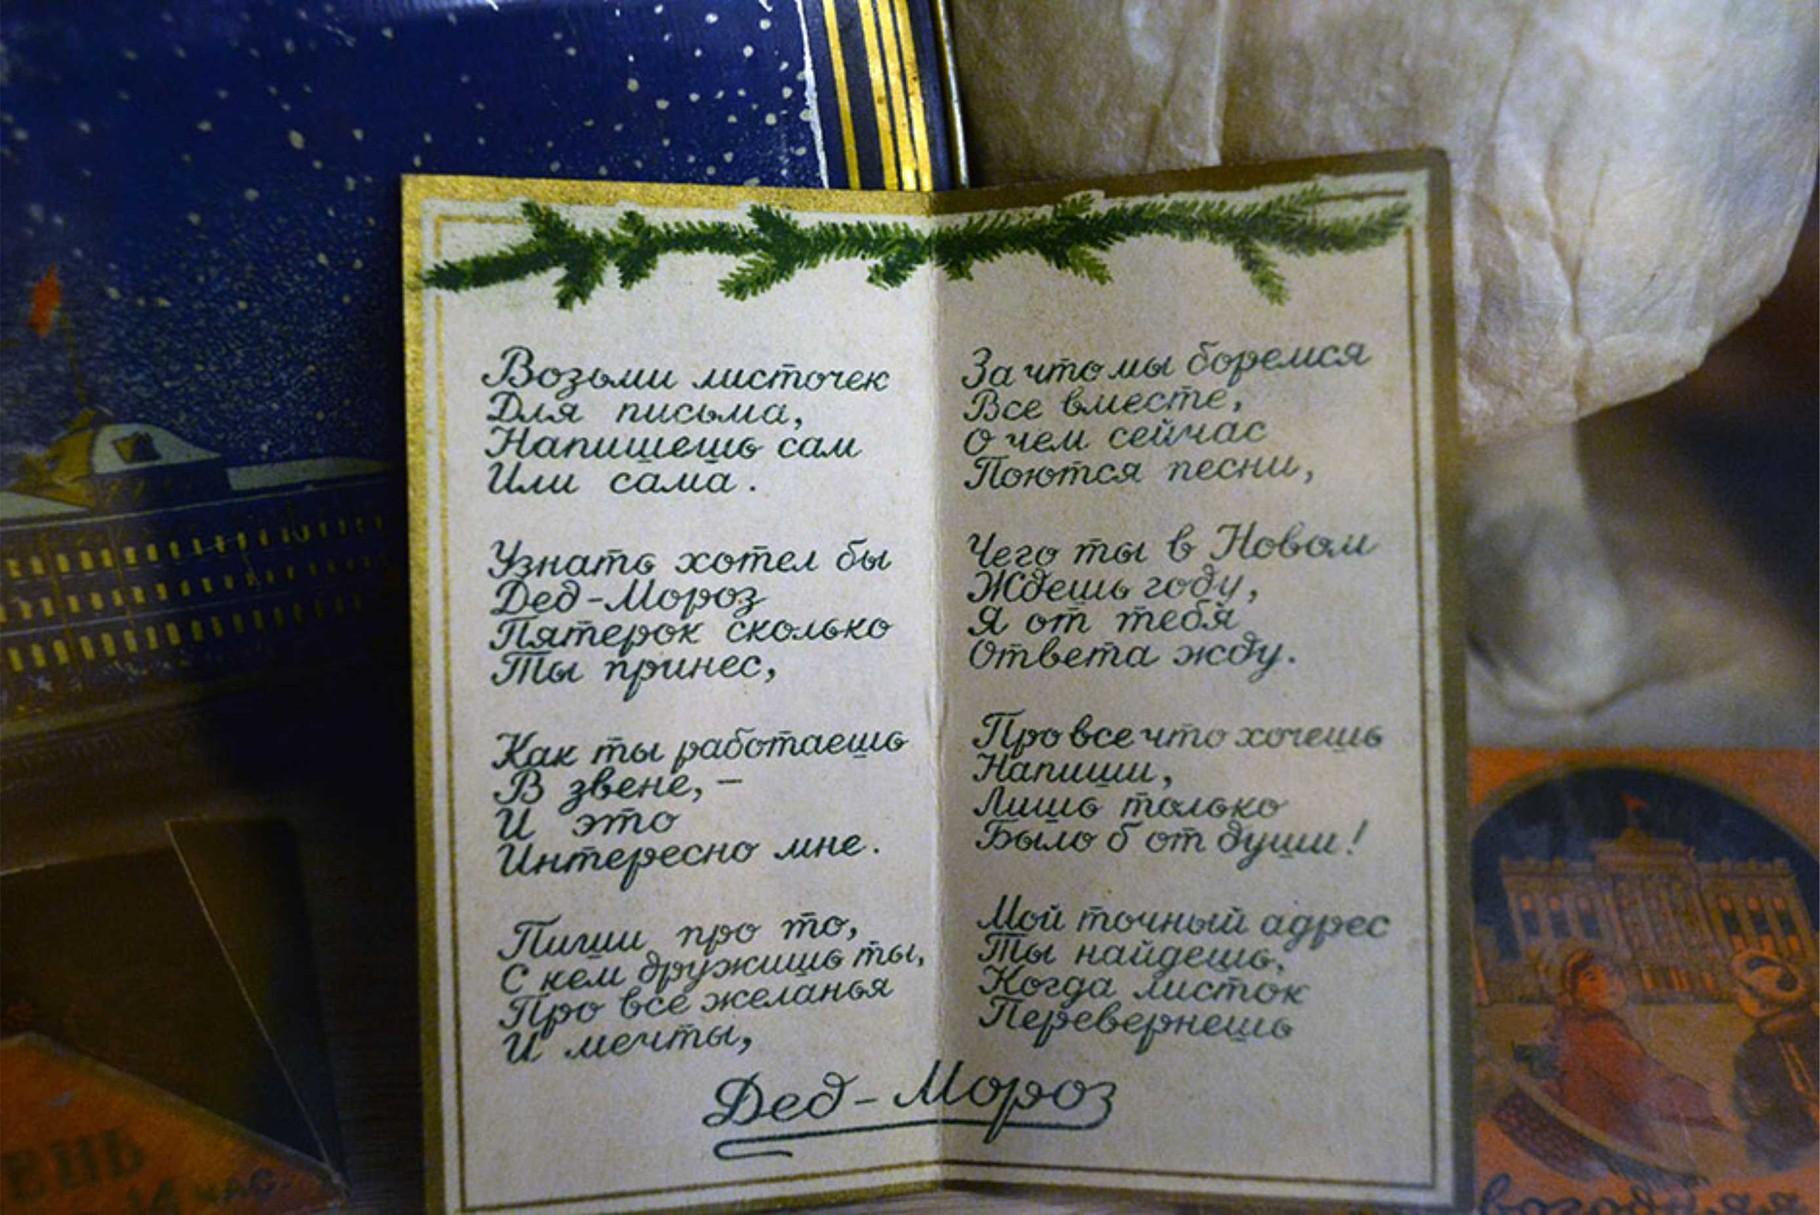 Письмо Деда Мороза. Новогодняя открытка. Середина XX века.